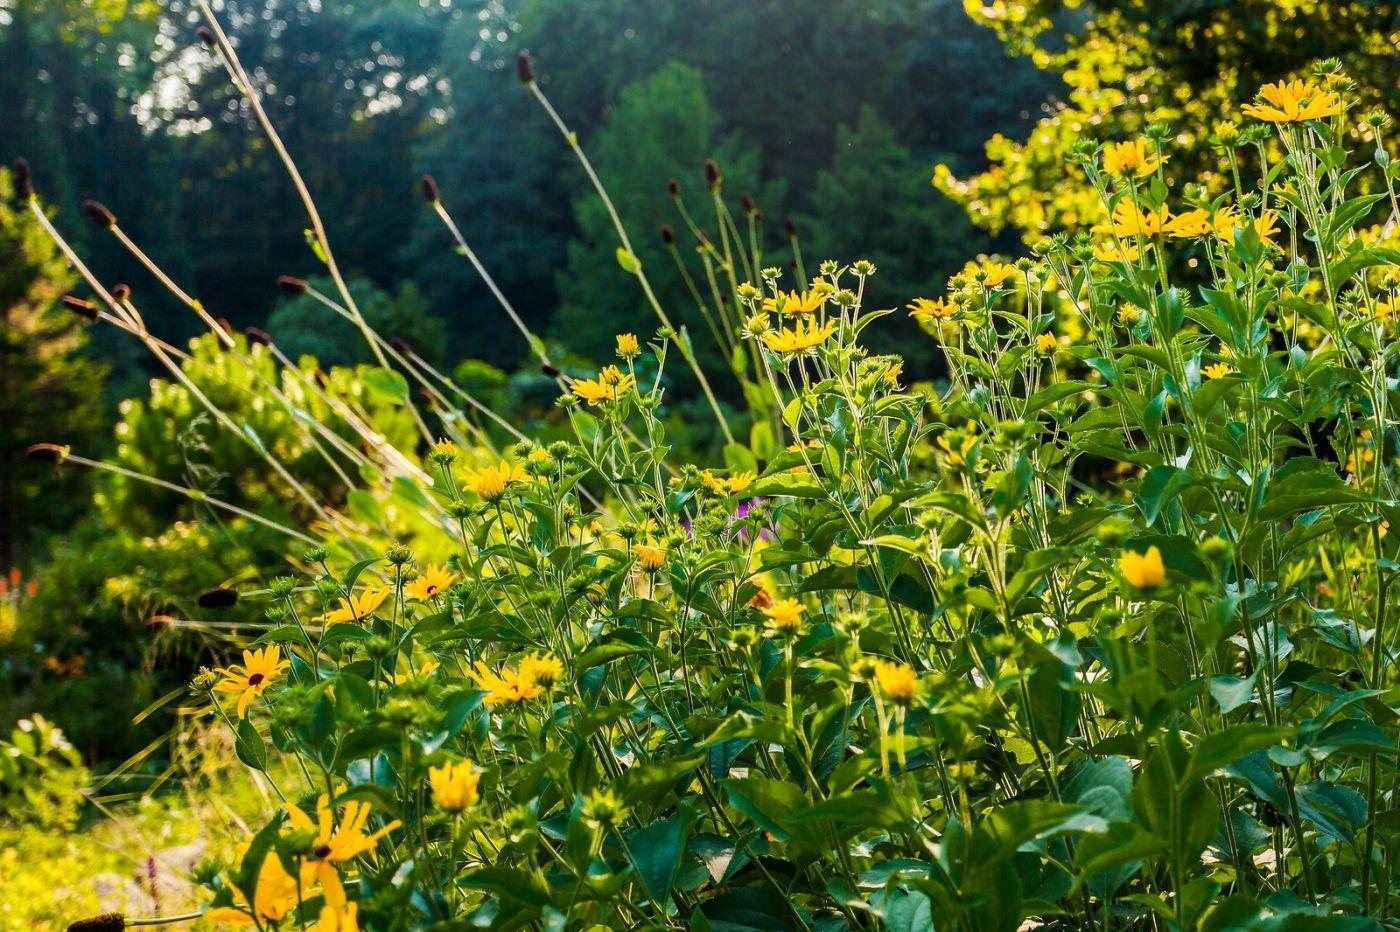 Chanticleer花园,有梦想的季节_图1-31